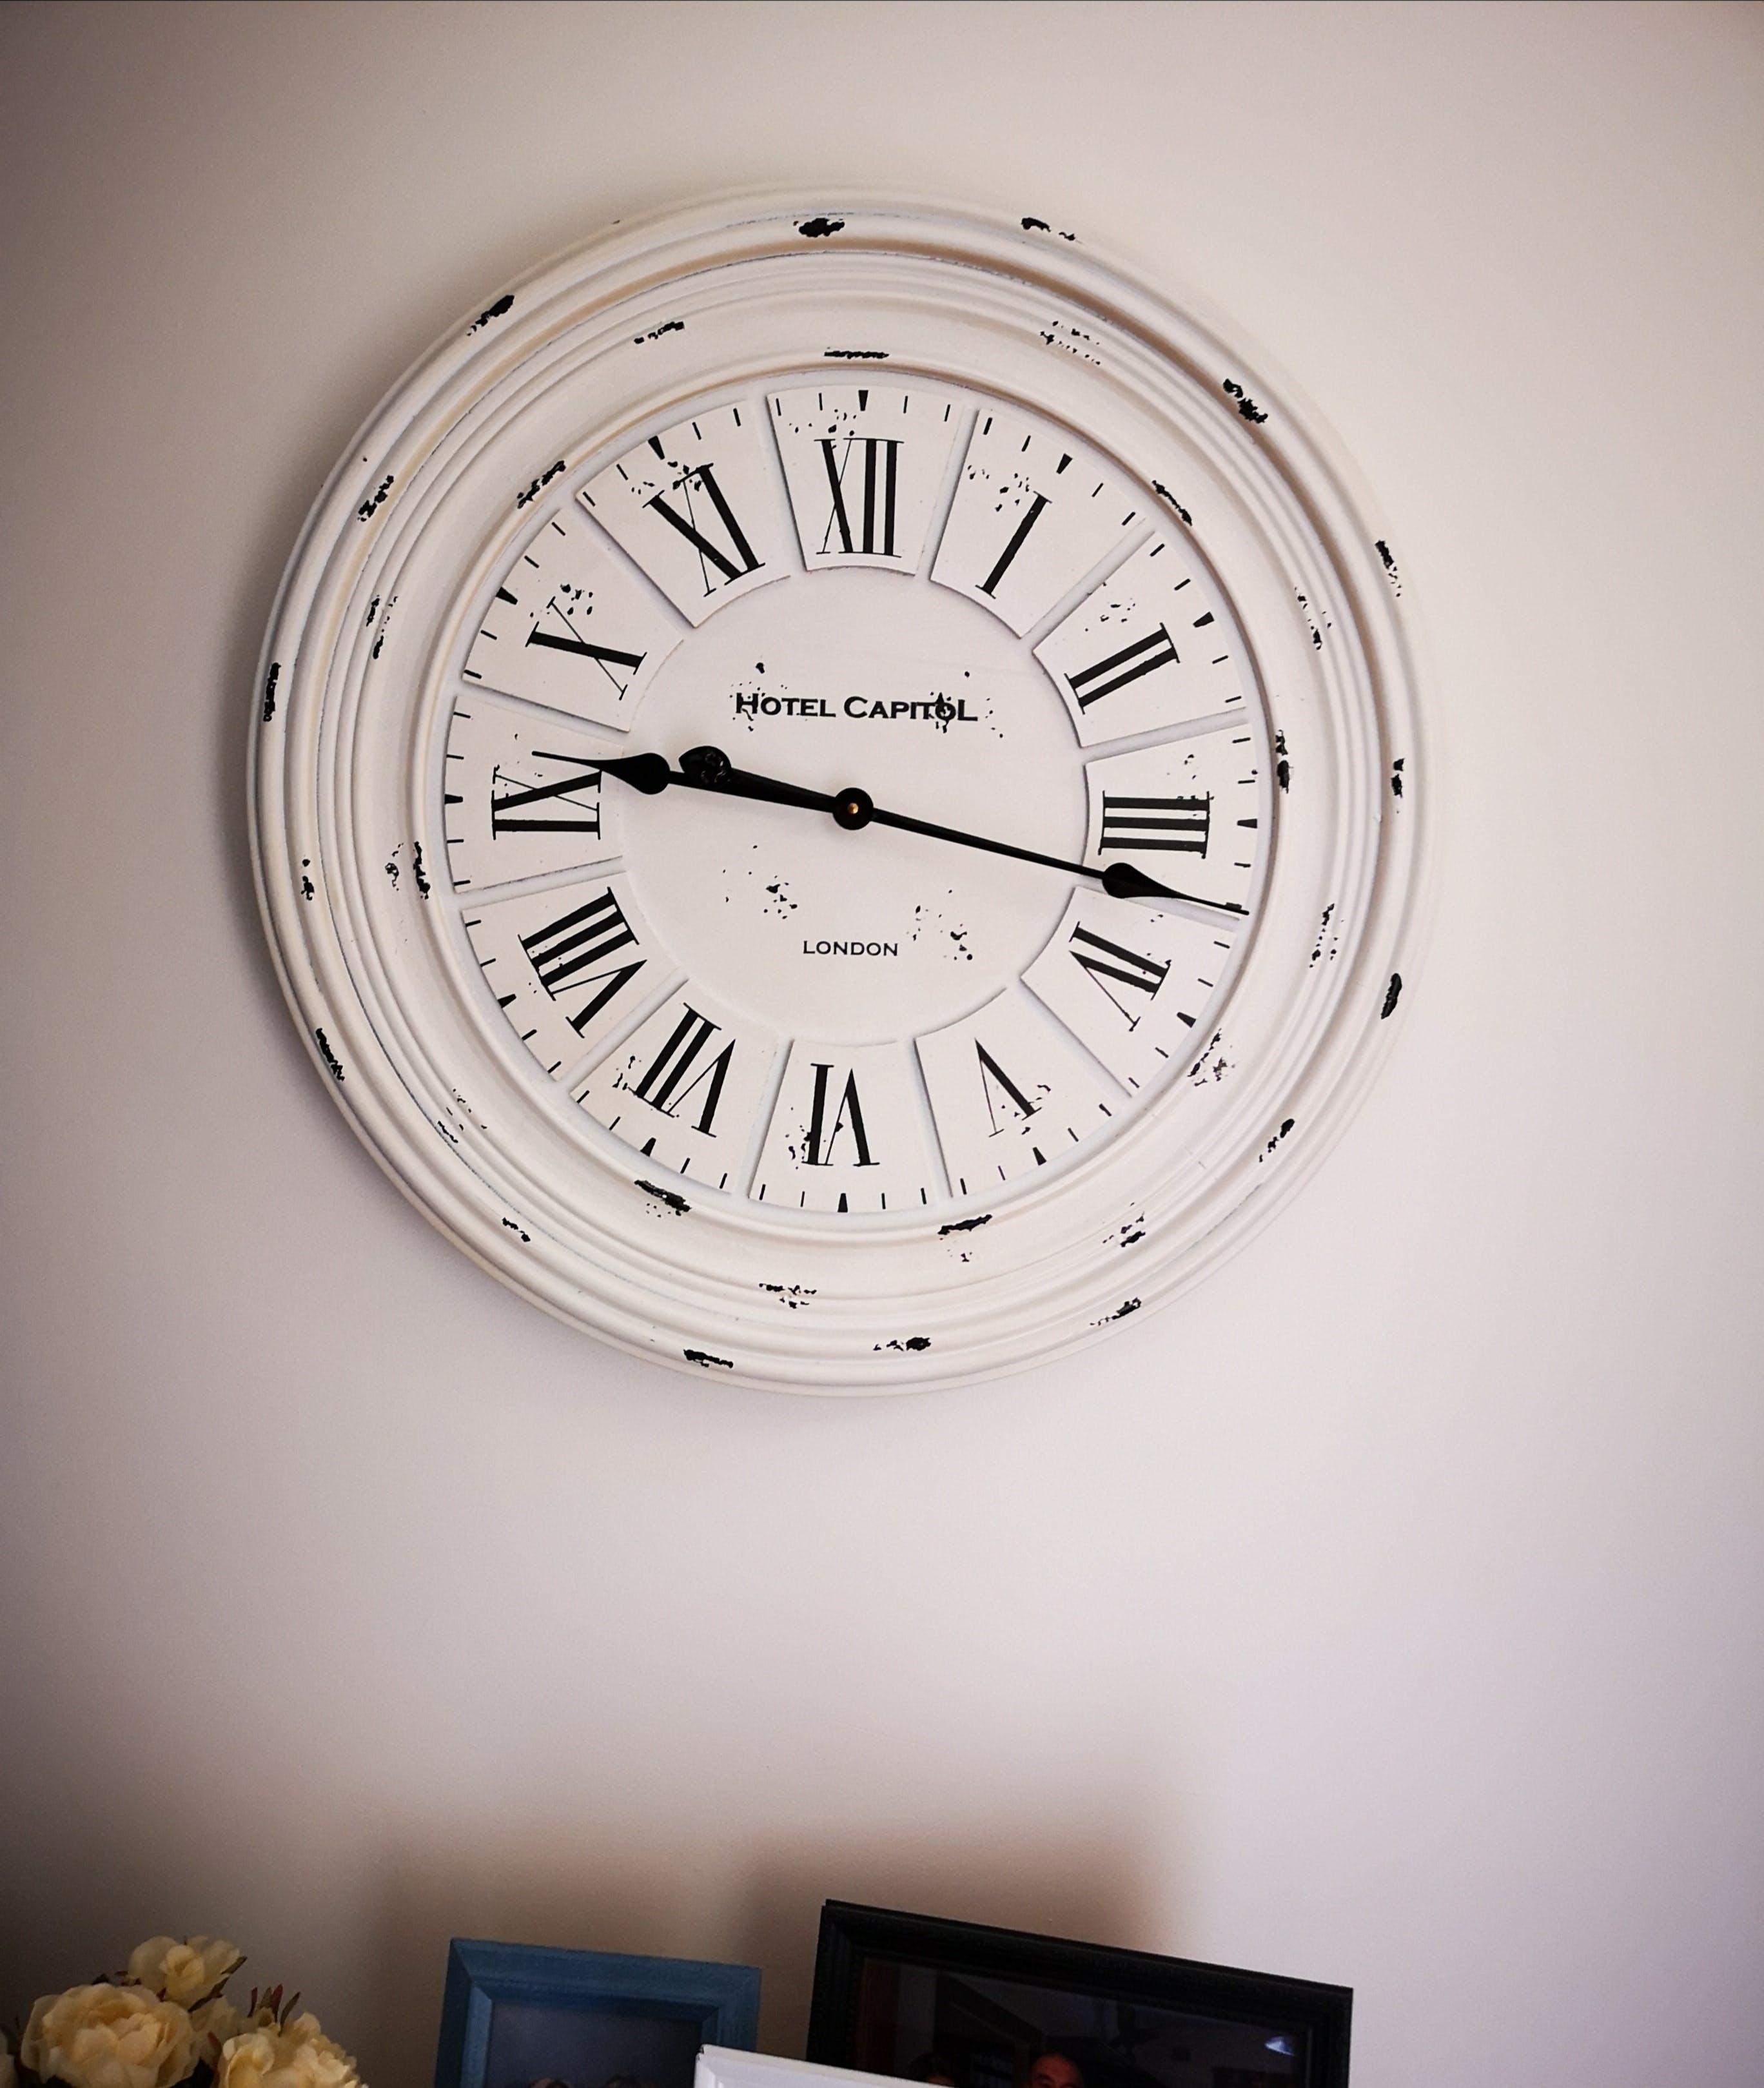 Casa Uno Hotel Capitol Wall Clock, 68cm